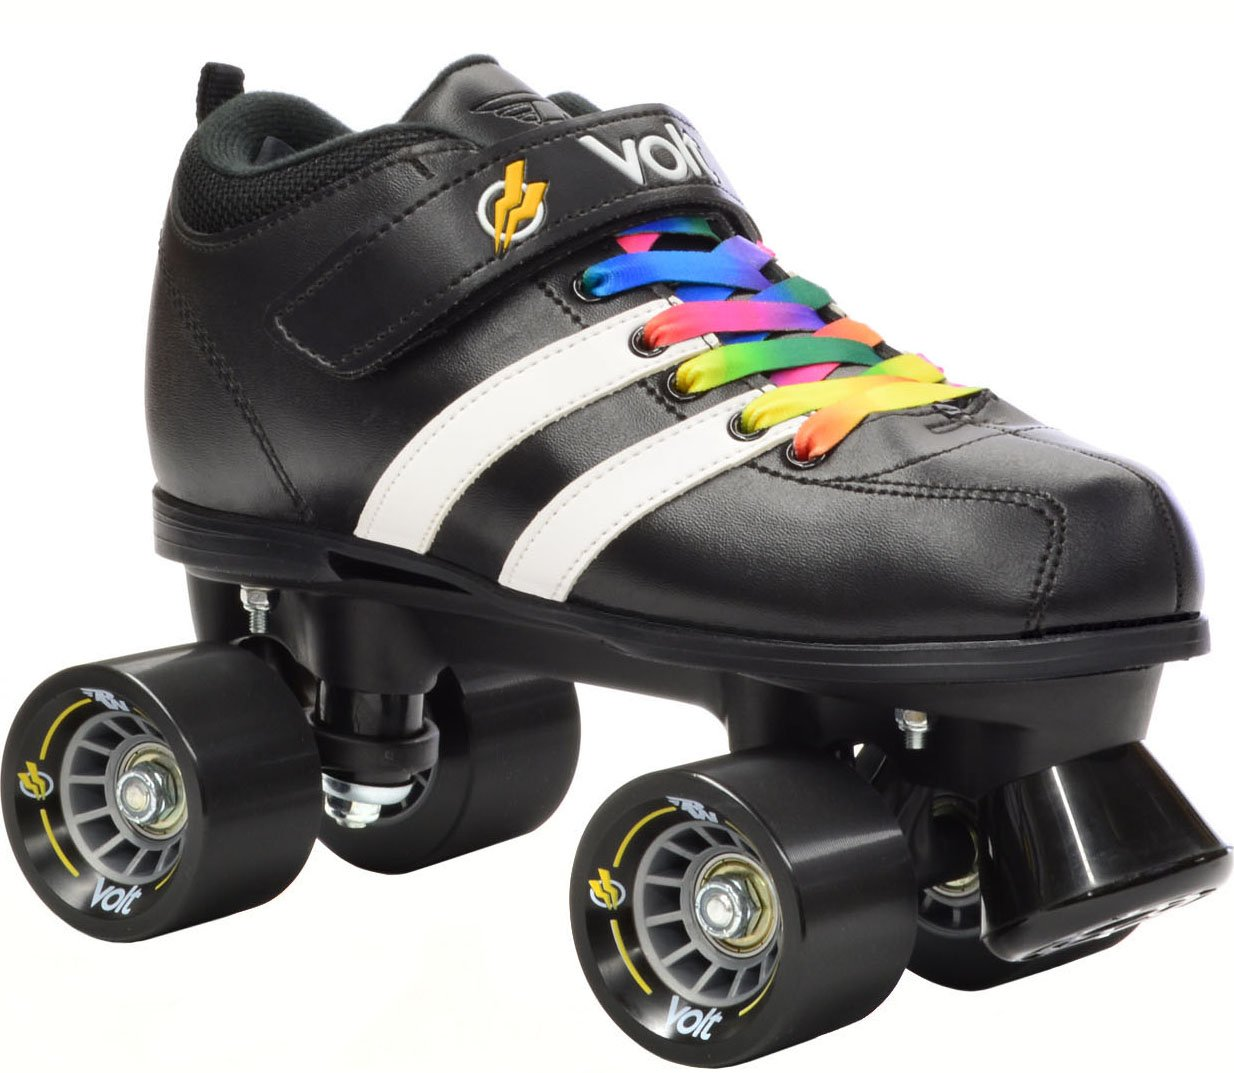 Riedell RW Volt Rainbow Skates - Riedell RW Volt Speed Skates - Volt Rainbow Skate Size 9